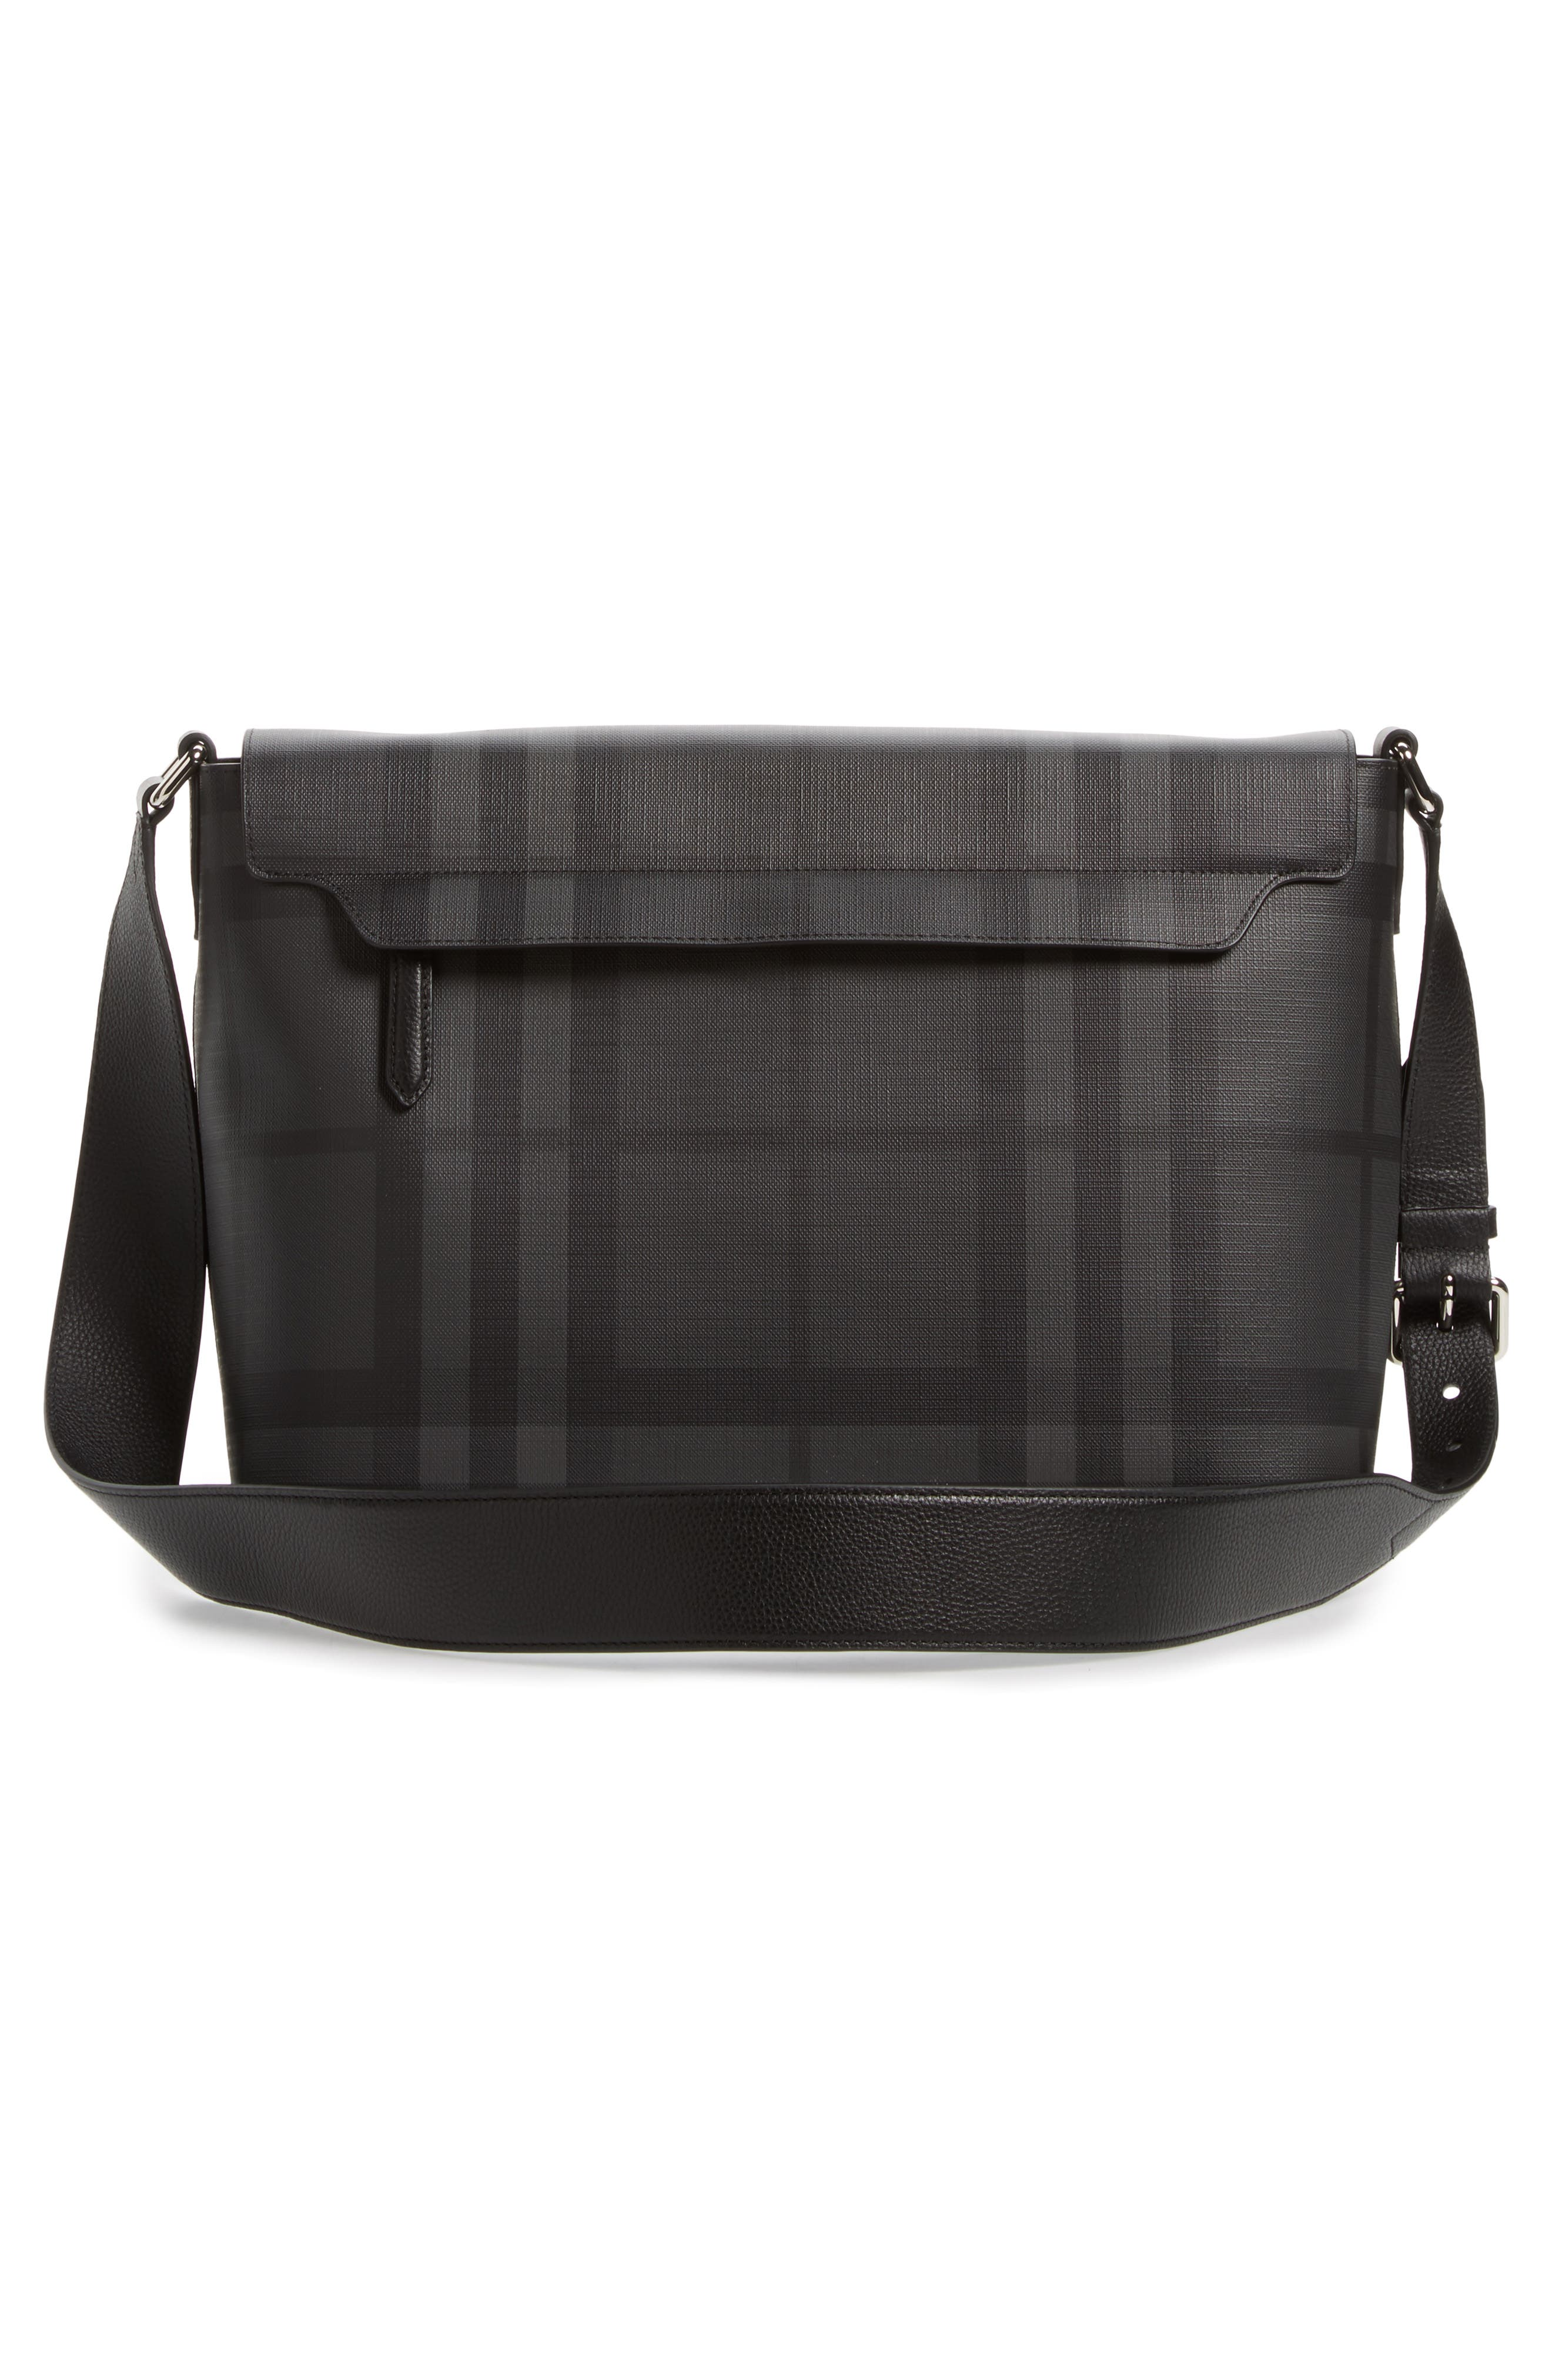 London Check Messenger Bag,                             Alternate thumbnail 3, color,                             Charcoal/ Black